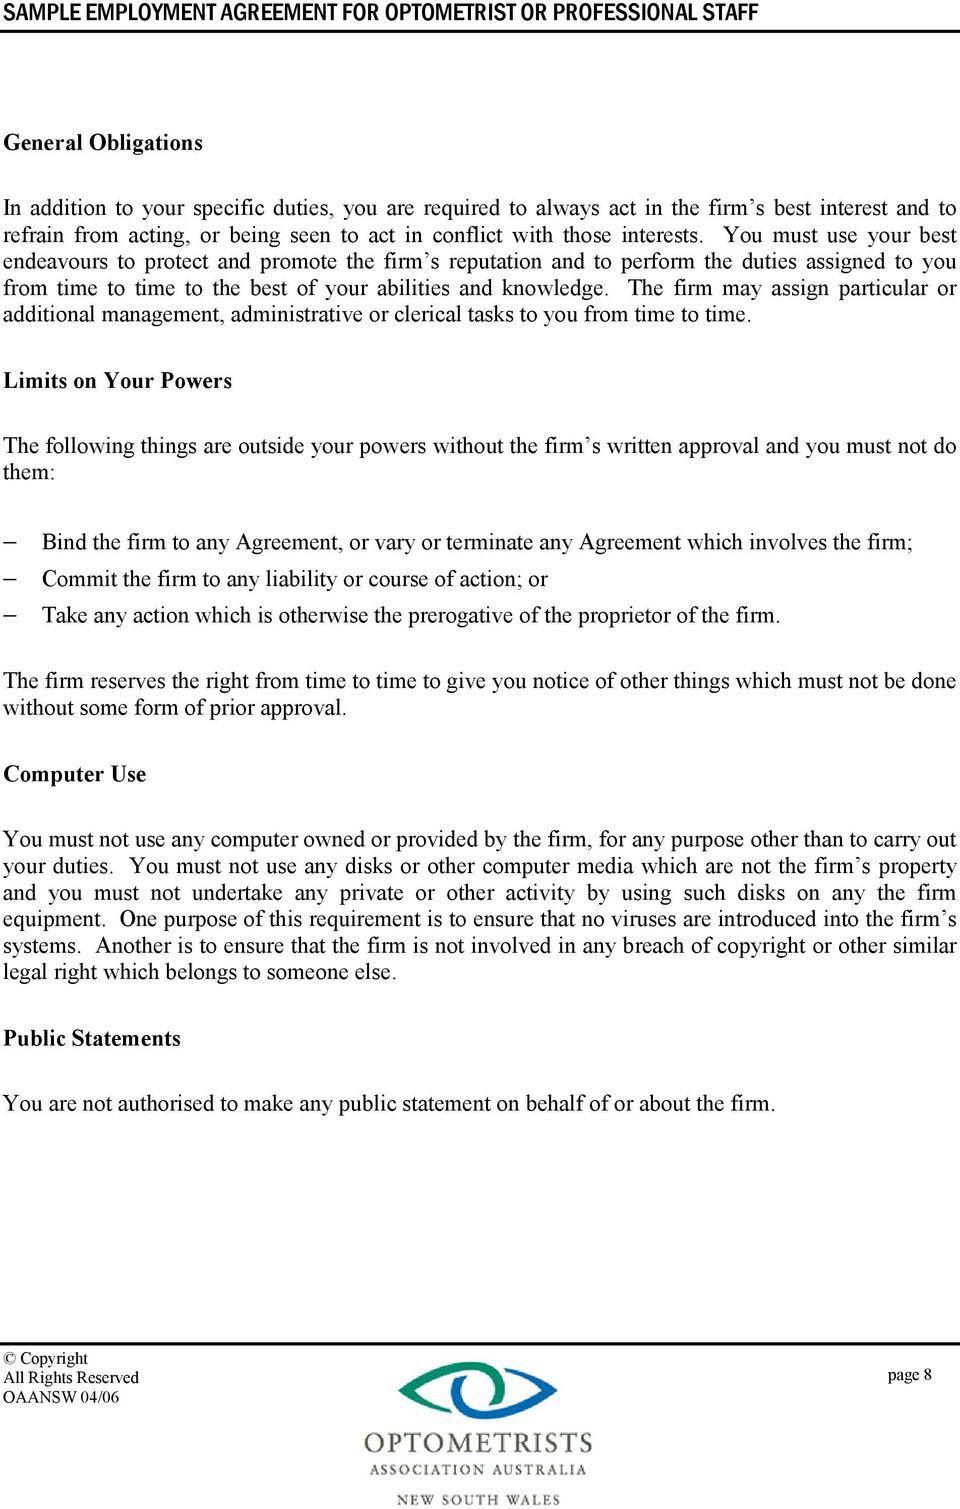 007 Wondrou Free Casual Employment Contract Template Australia Sample Full